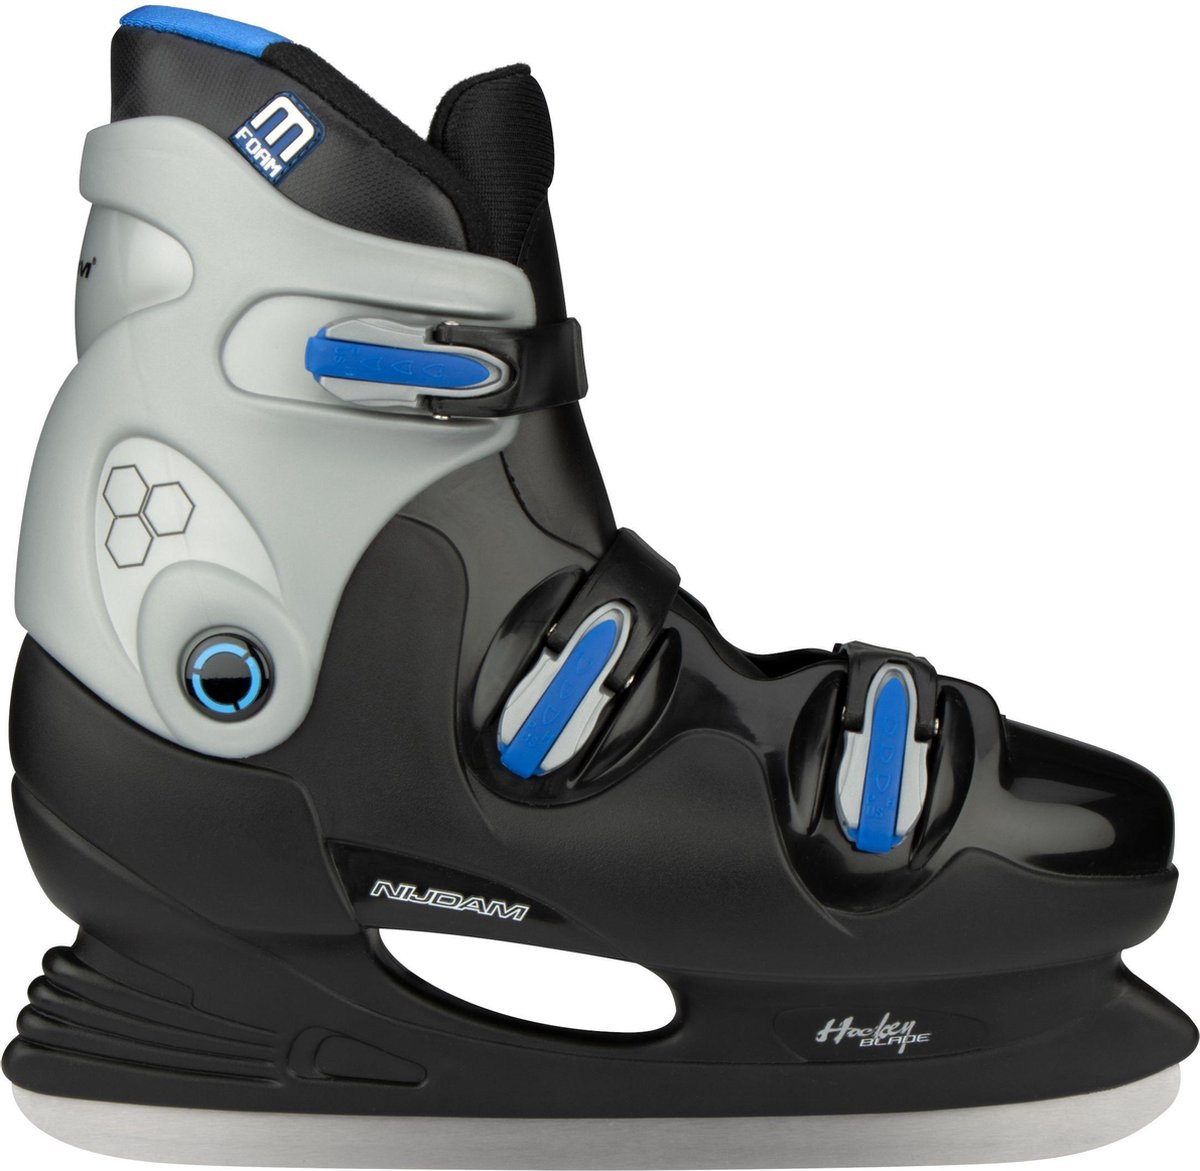 Nijdam IJshockeyschaats - Hardboot - Zwart/Blauw - Maat 35